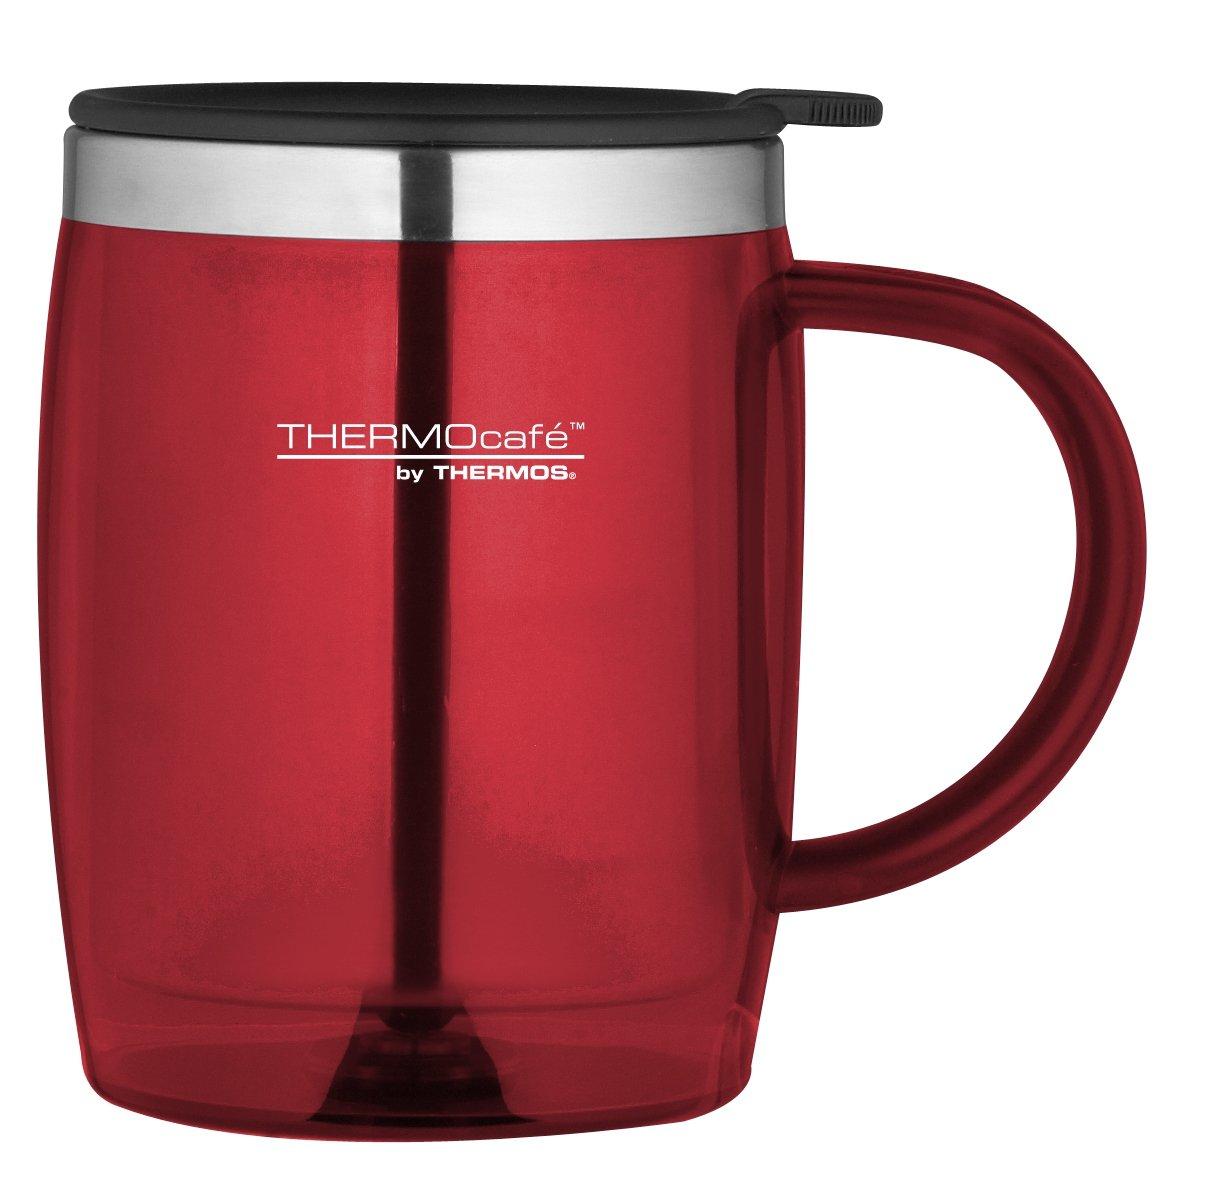 thermos thermocafe desk mug 450 ml red red desk mug thermo cafe ebay. Black Bedroom Furniture Sets. Home Design Ideas